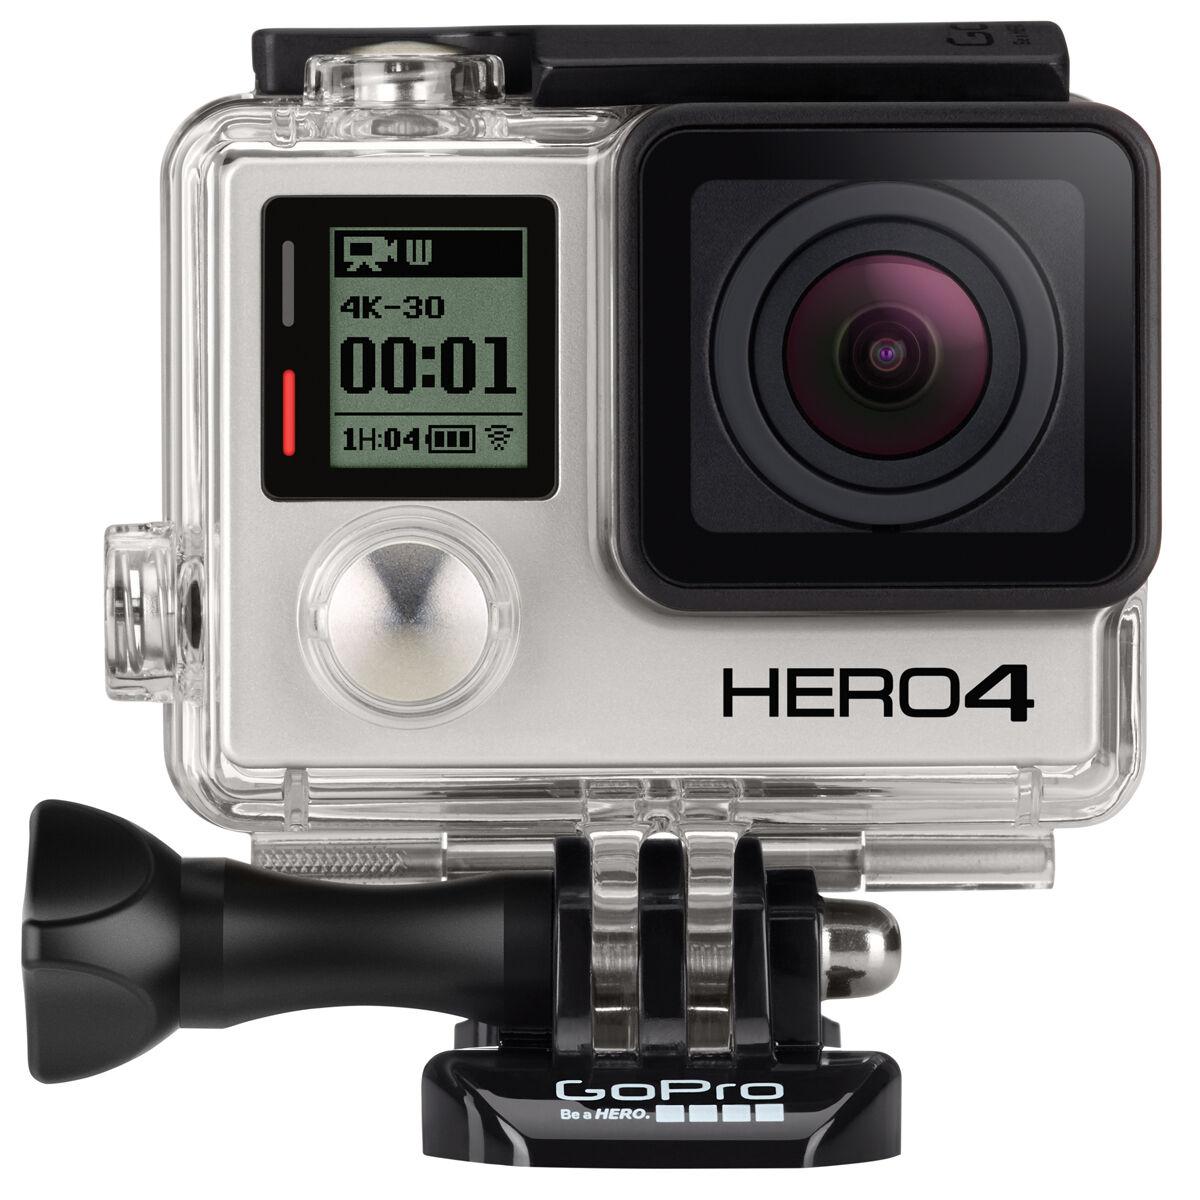 Купить GoPro - GoPro HERO4 Black Edition Camera Manufacturer Refurbished